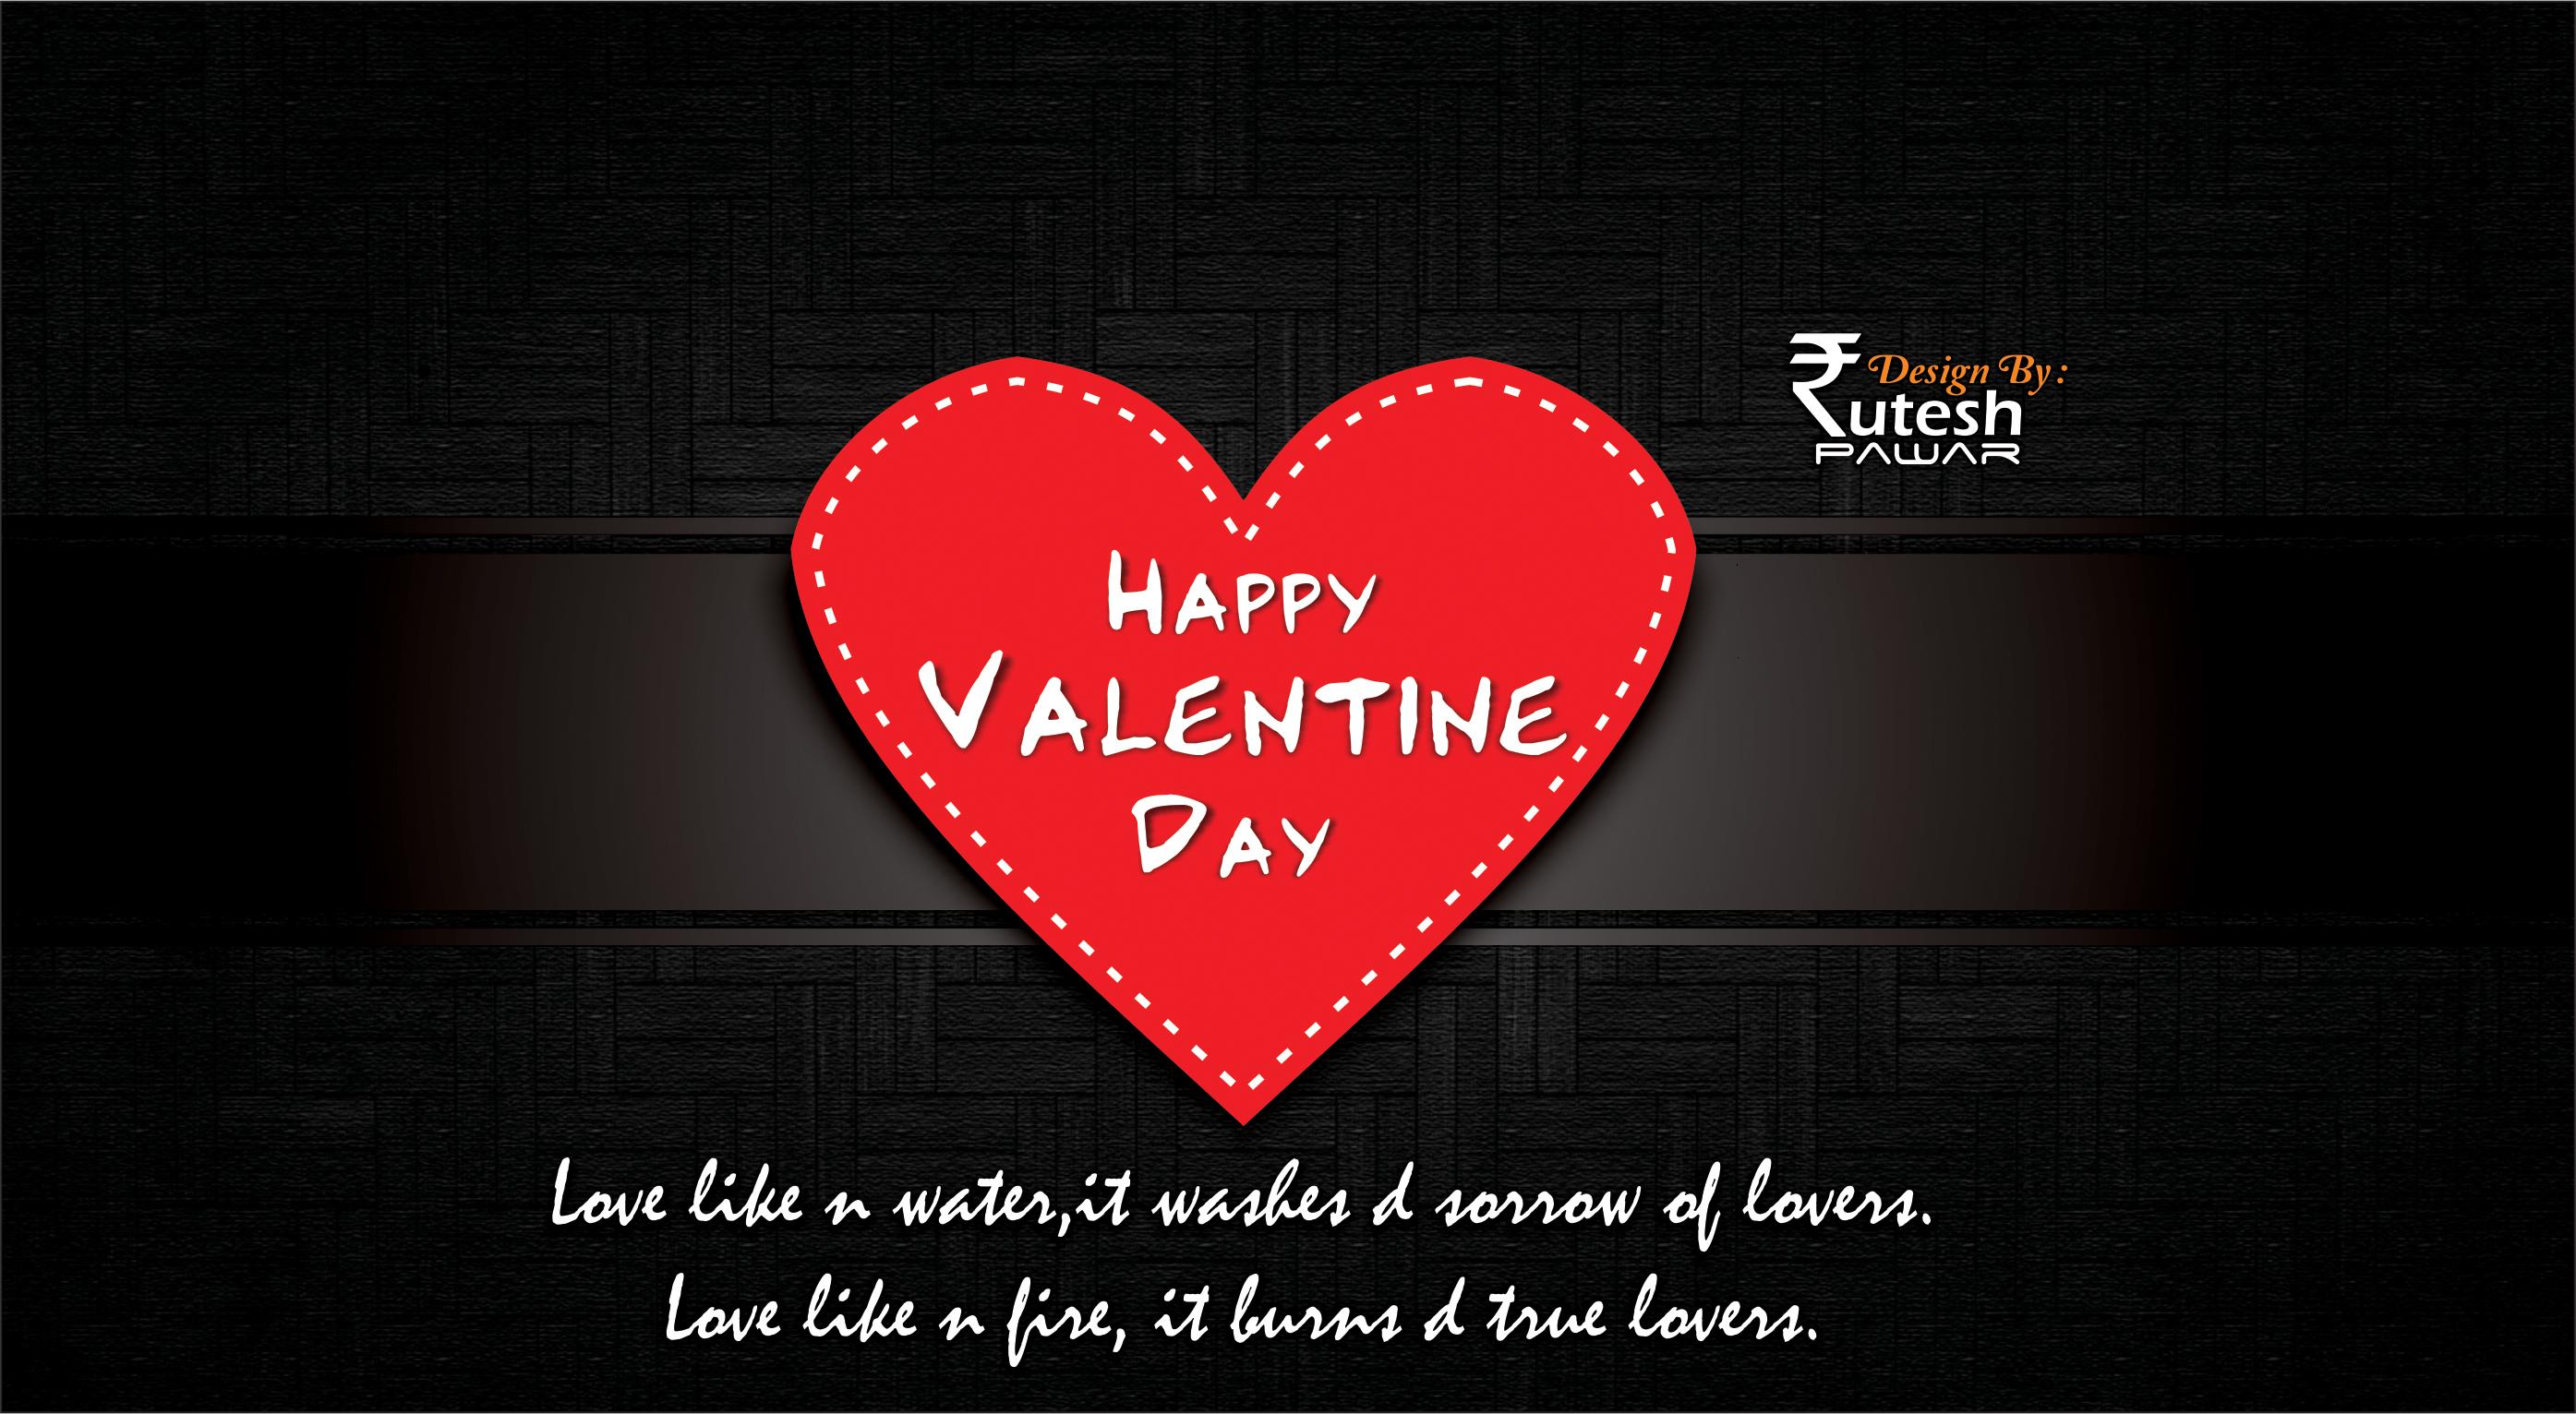 Valentines Day  8bbwcom  XVIDEOSCOM